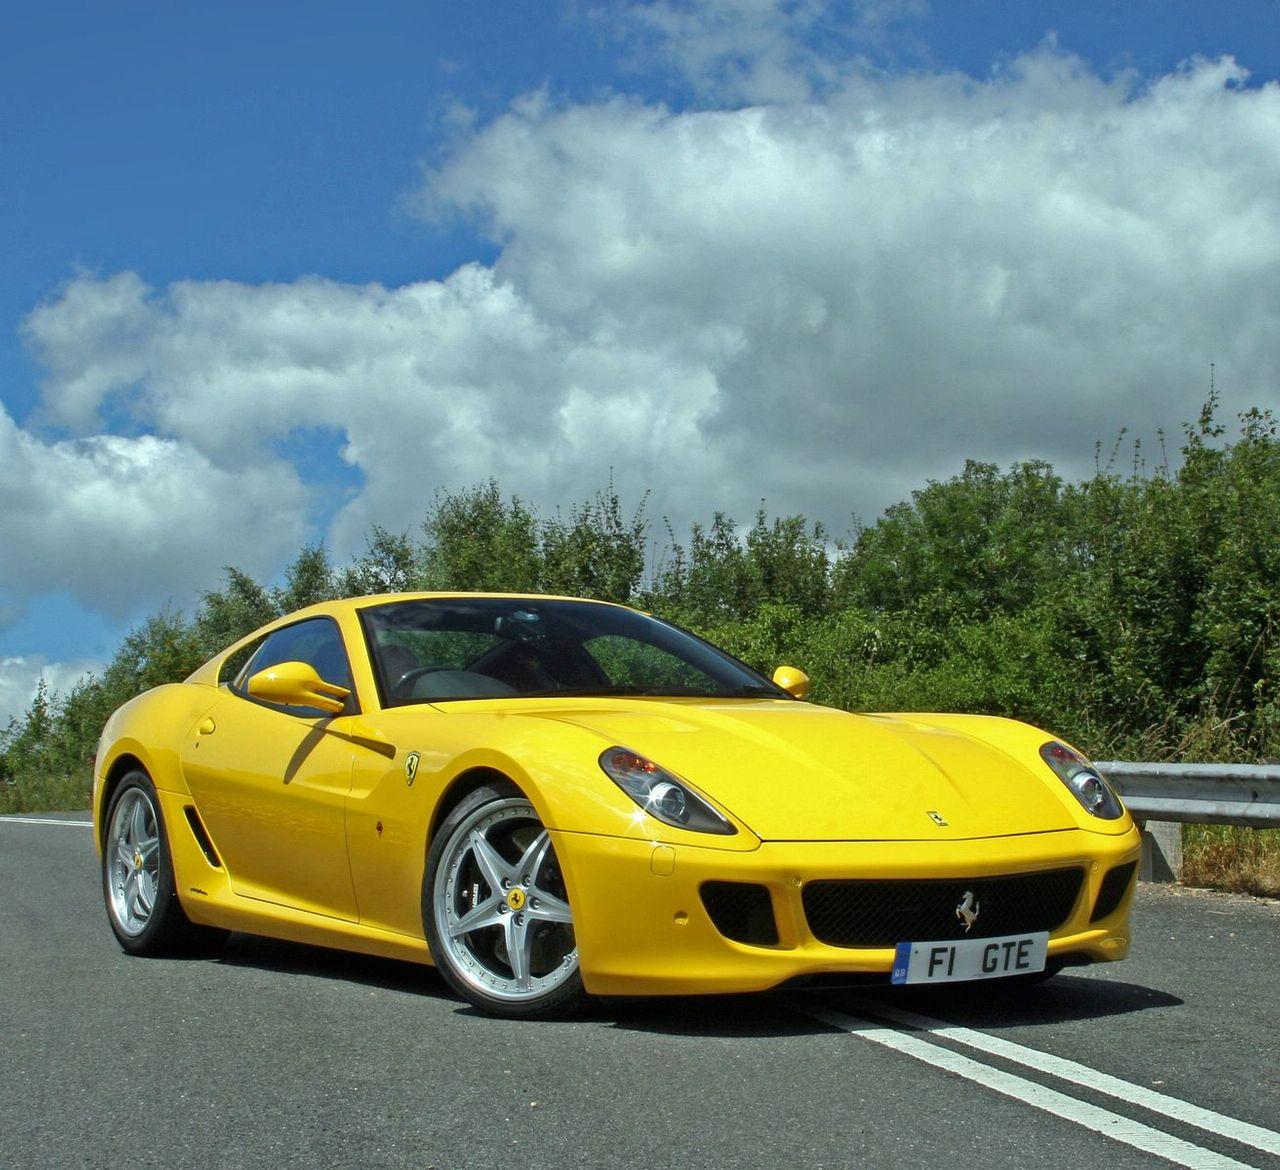 Club 4 Buzz: Yellow Ferrari